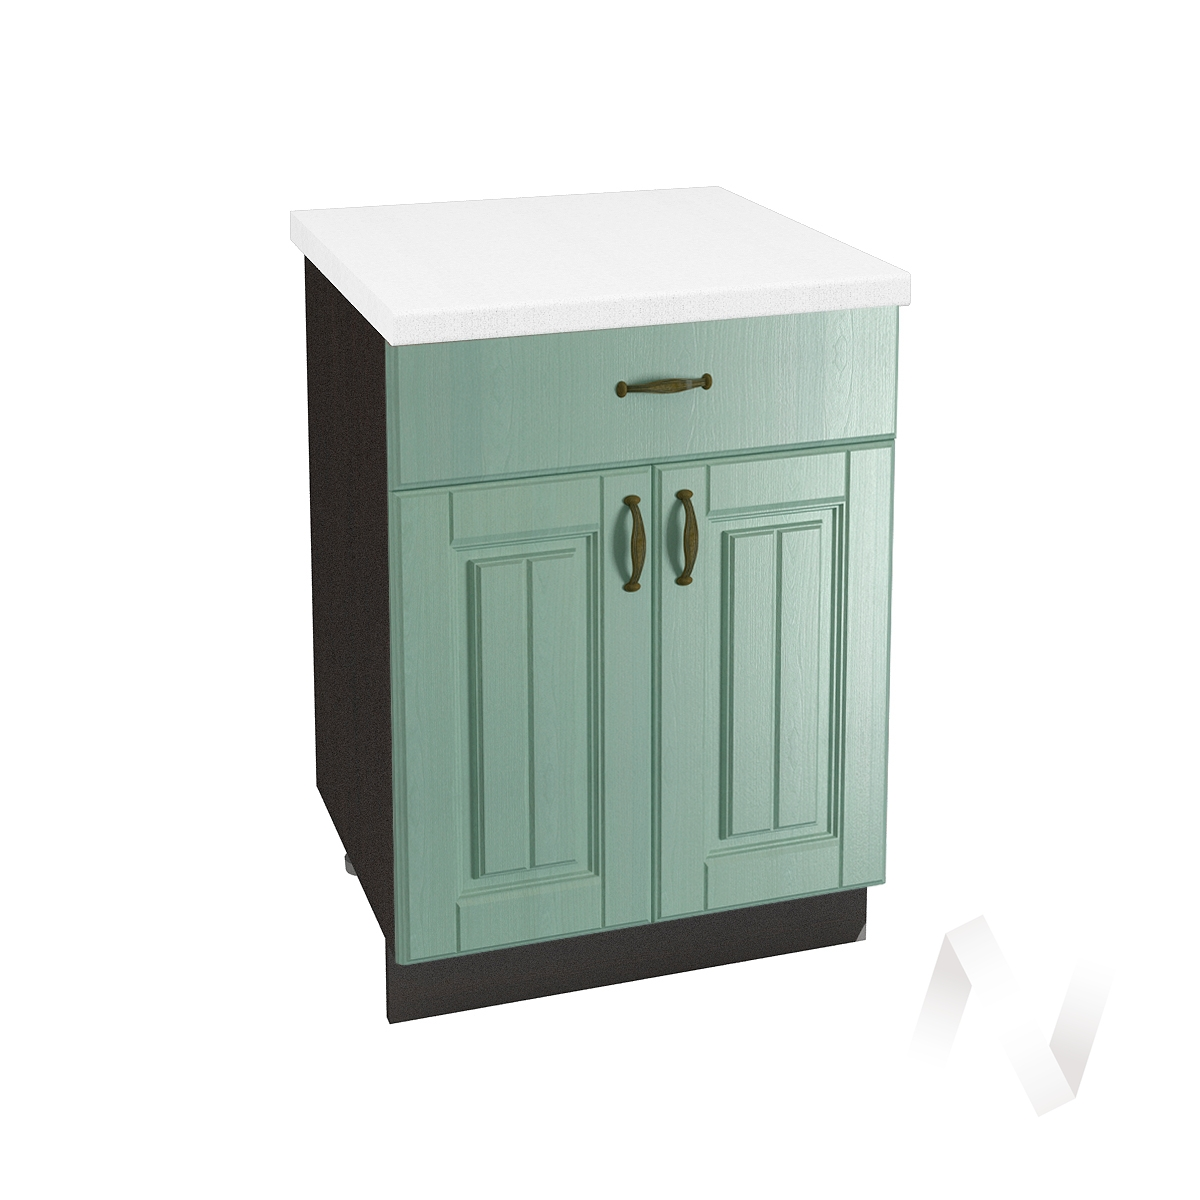 "Кухня ""Прованс"": Шкаф нижний с ящиком 600, ШН1Я 600 М (корпус венге)"